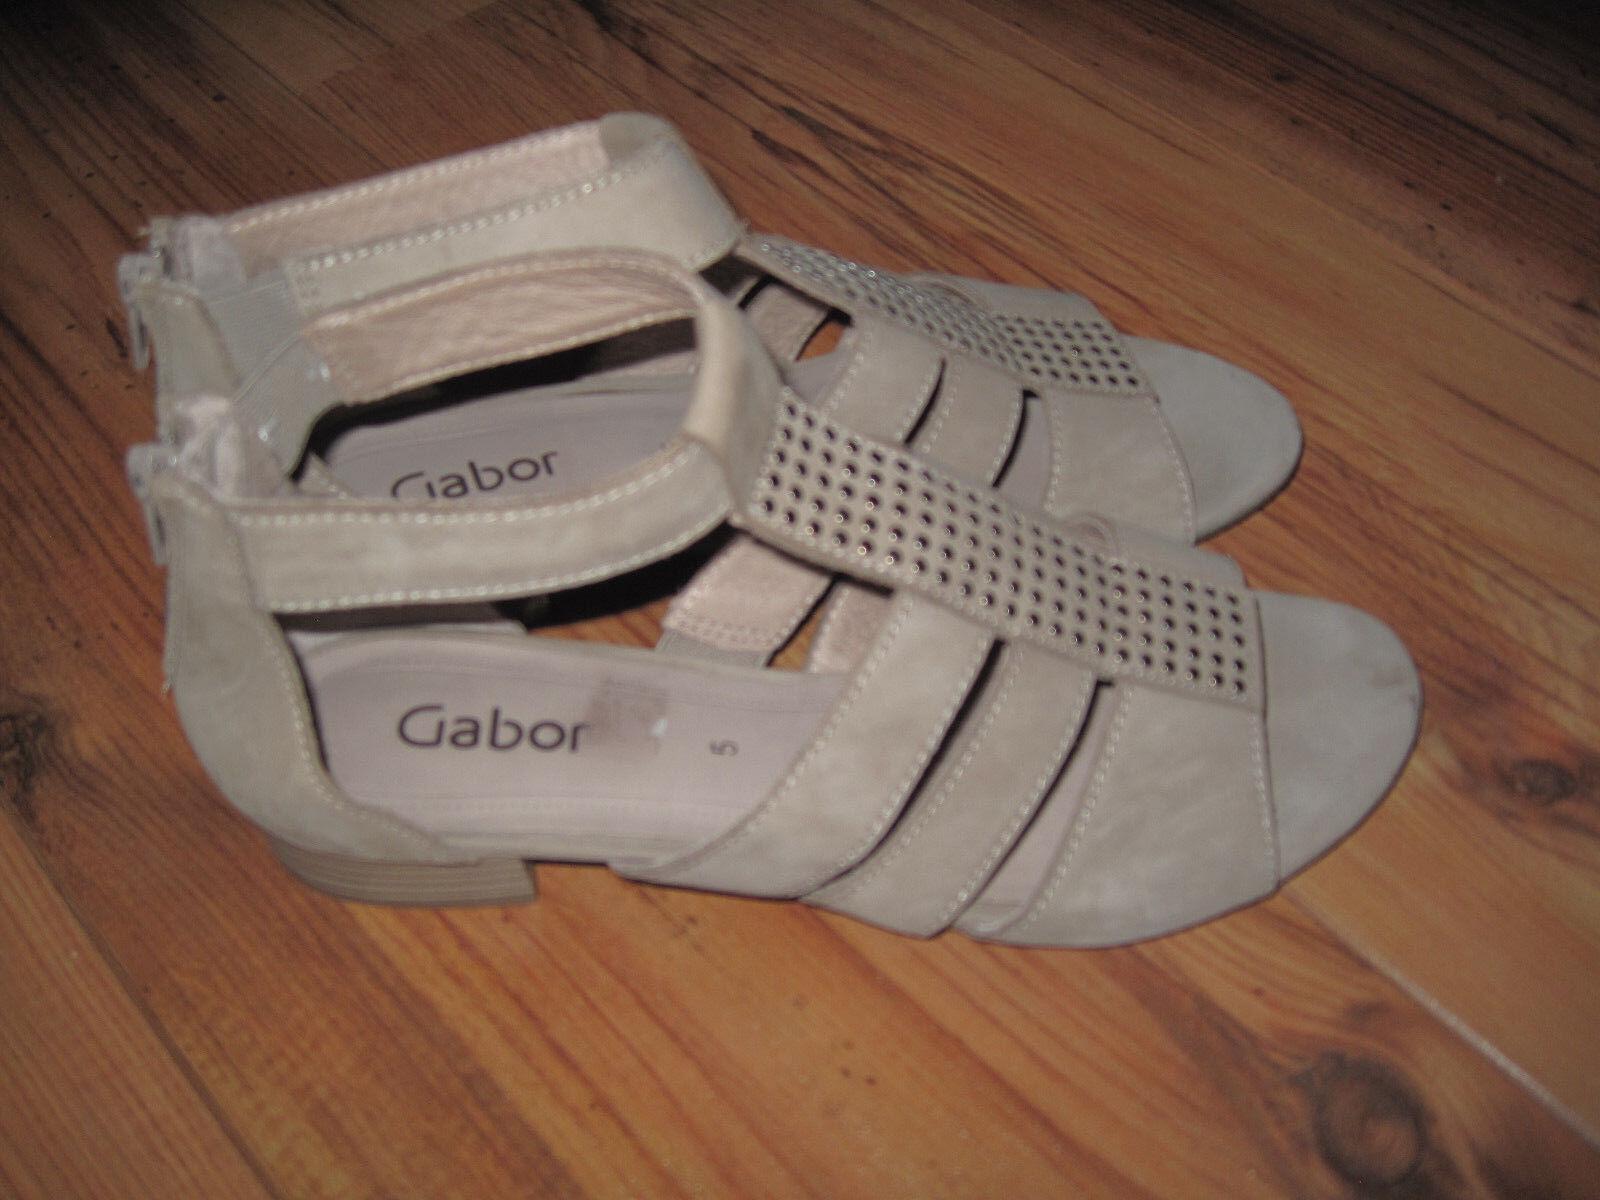 NEU: Gabor Damen Schuhe Sandale Sandaleetten Pumps Größe 38